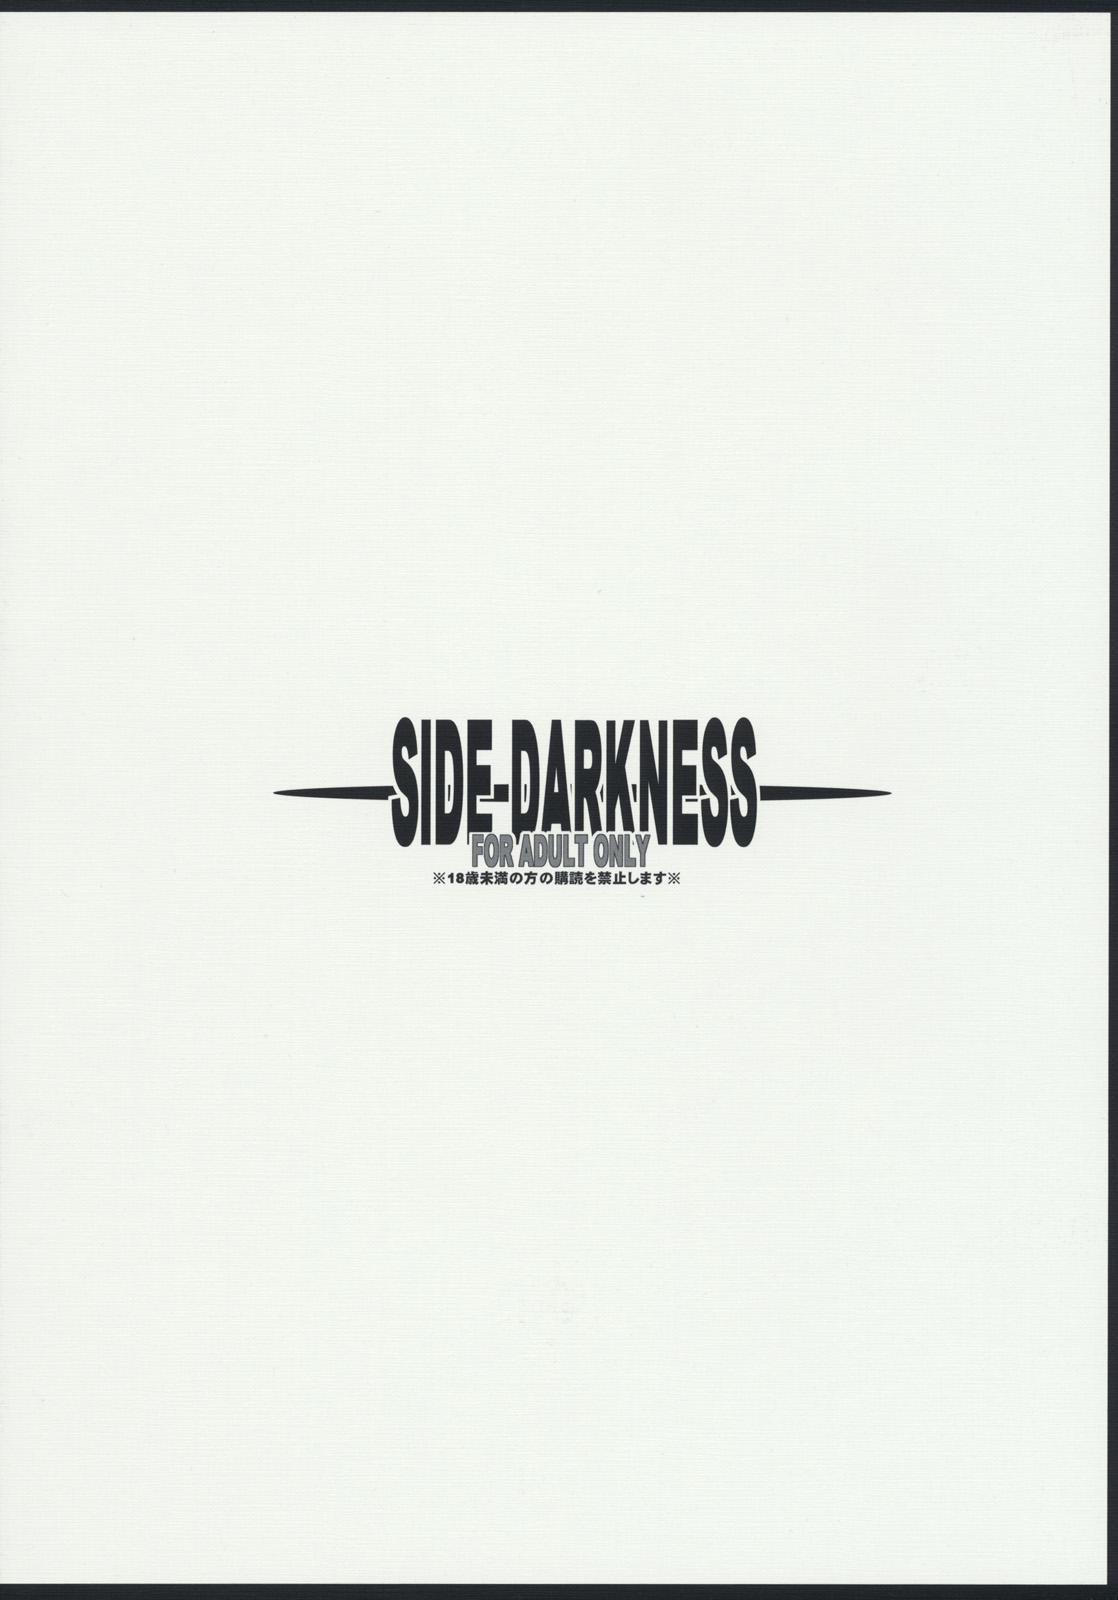 SIDE DARKNESS 13